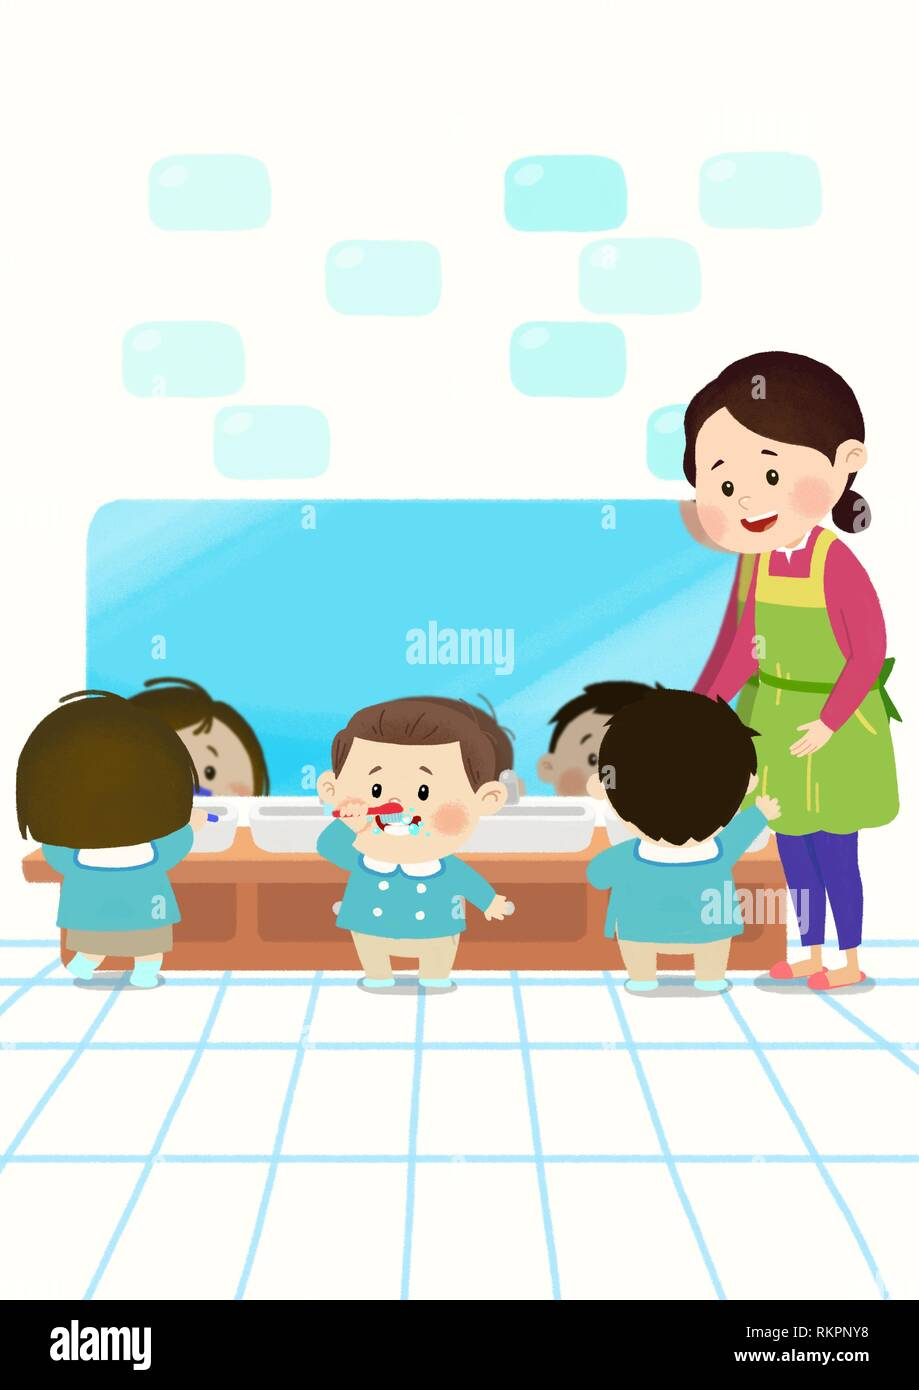 Preschool Kids daily life vector illustration 012 - Stock Vector